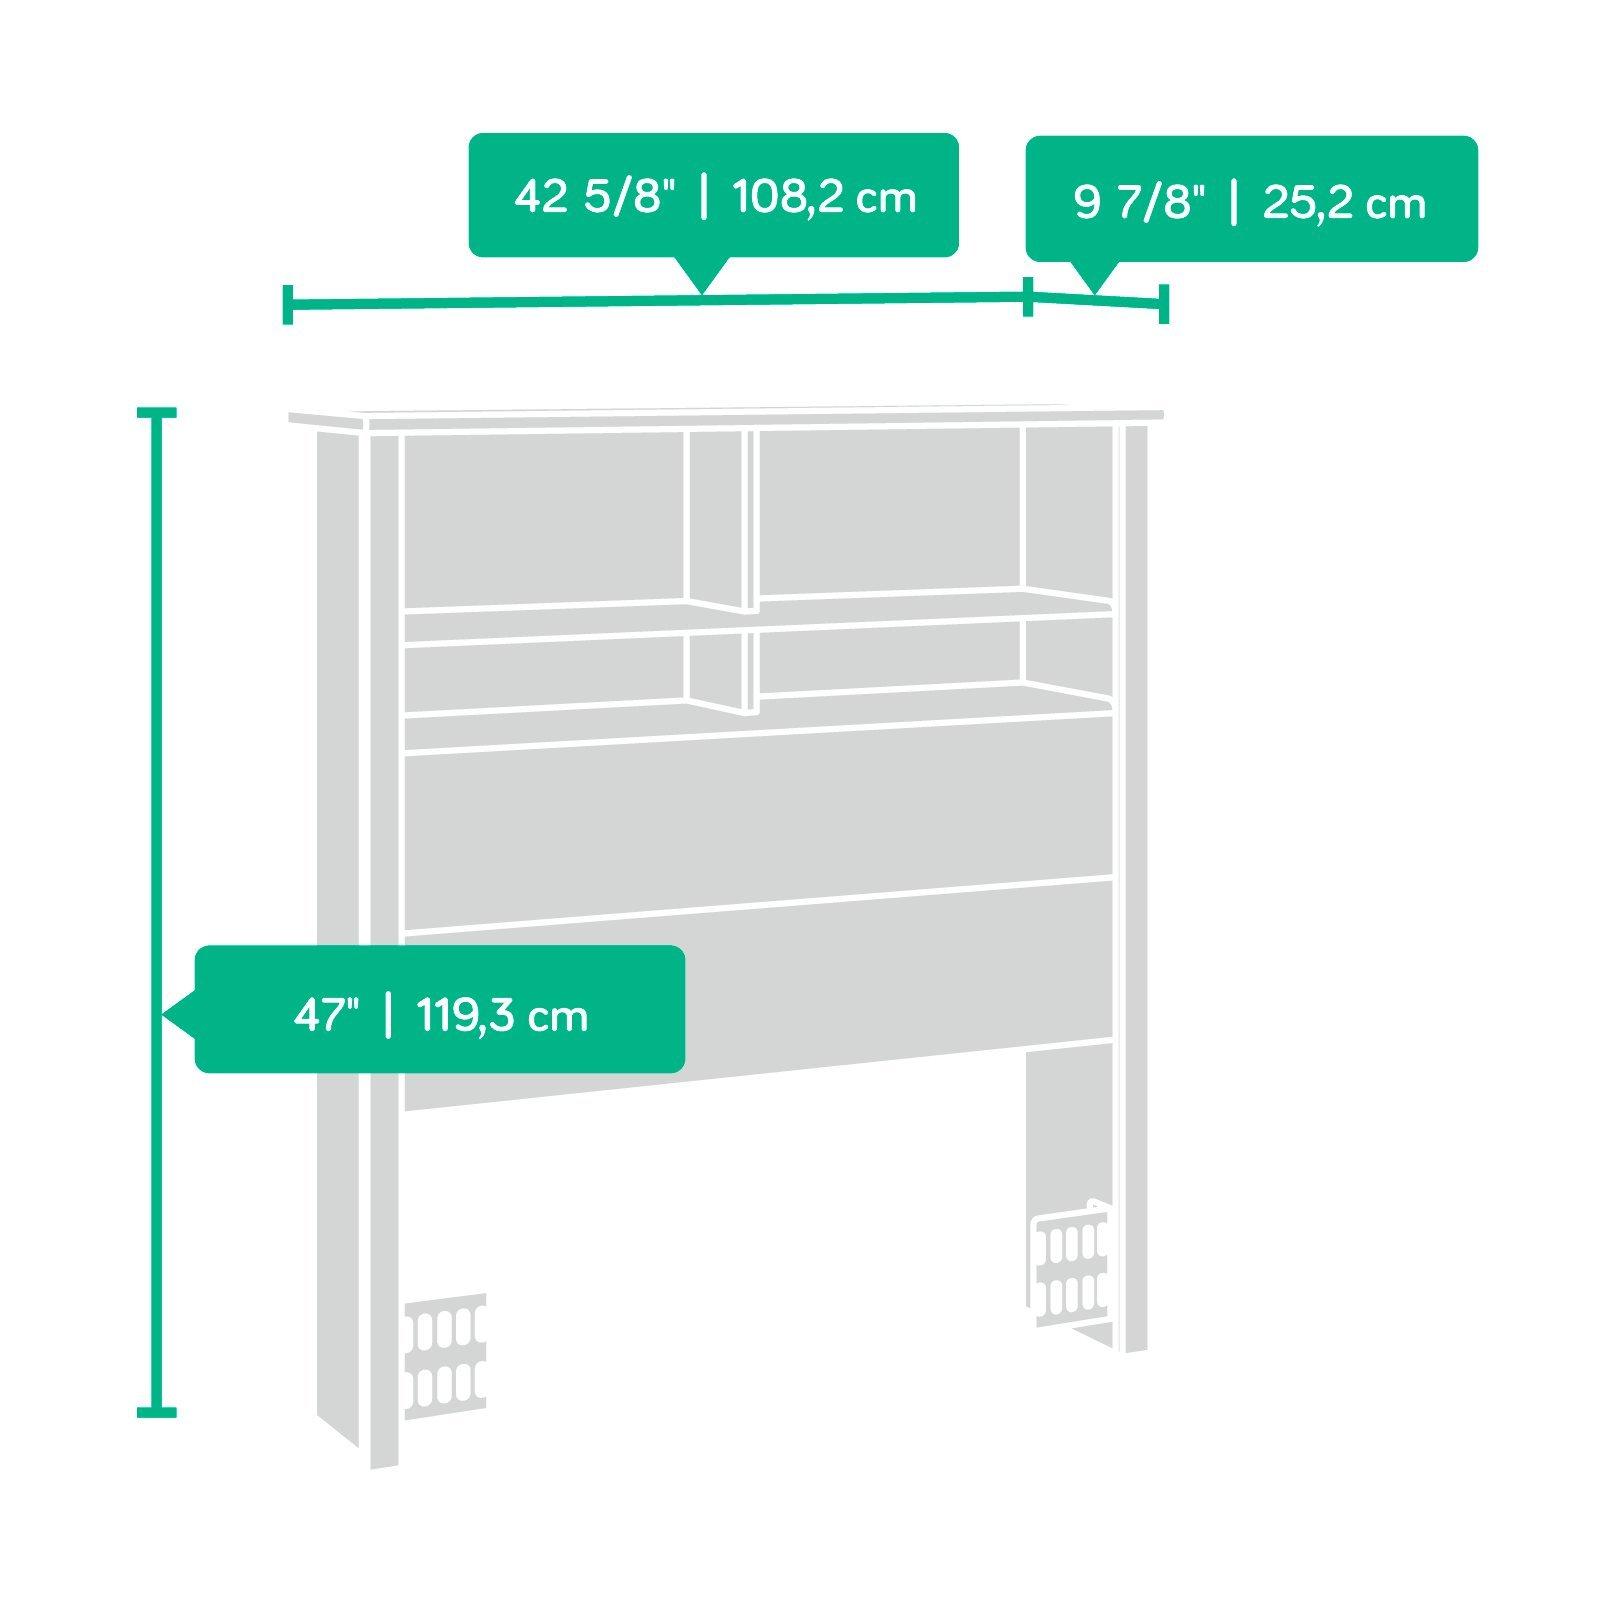 Sauder 418536 County Line Bookcase Headboard, Twin, Soft White